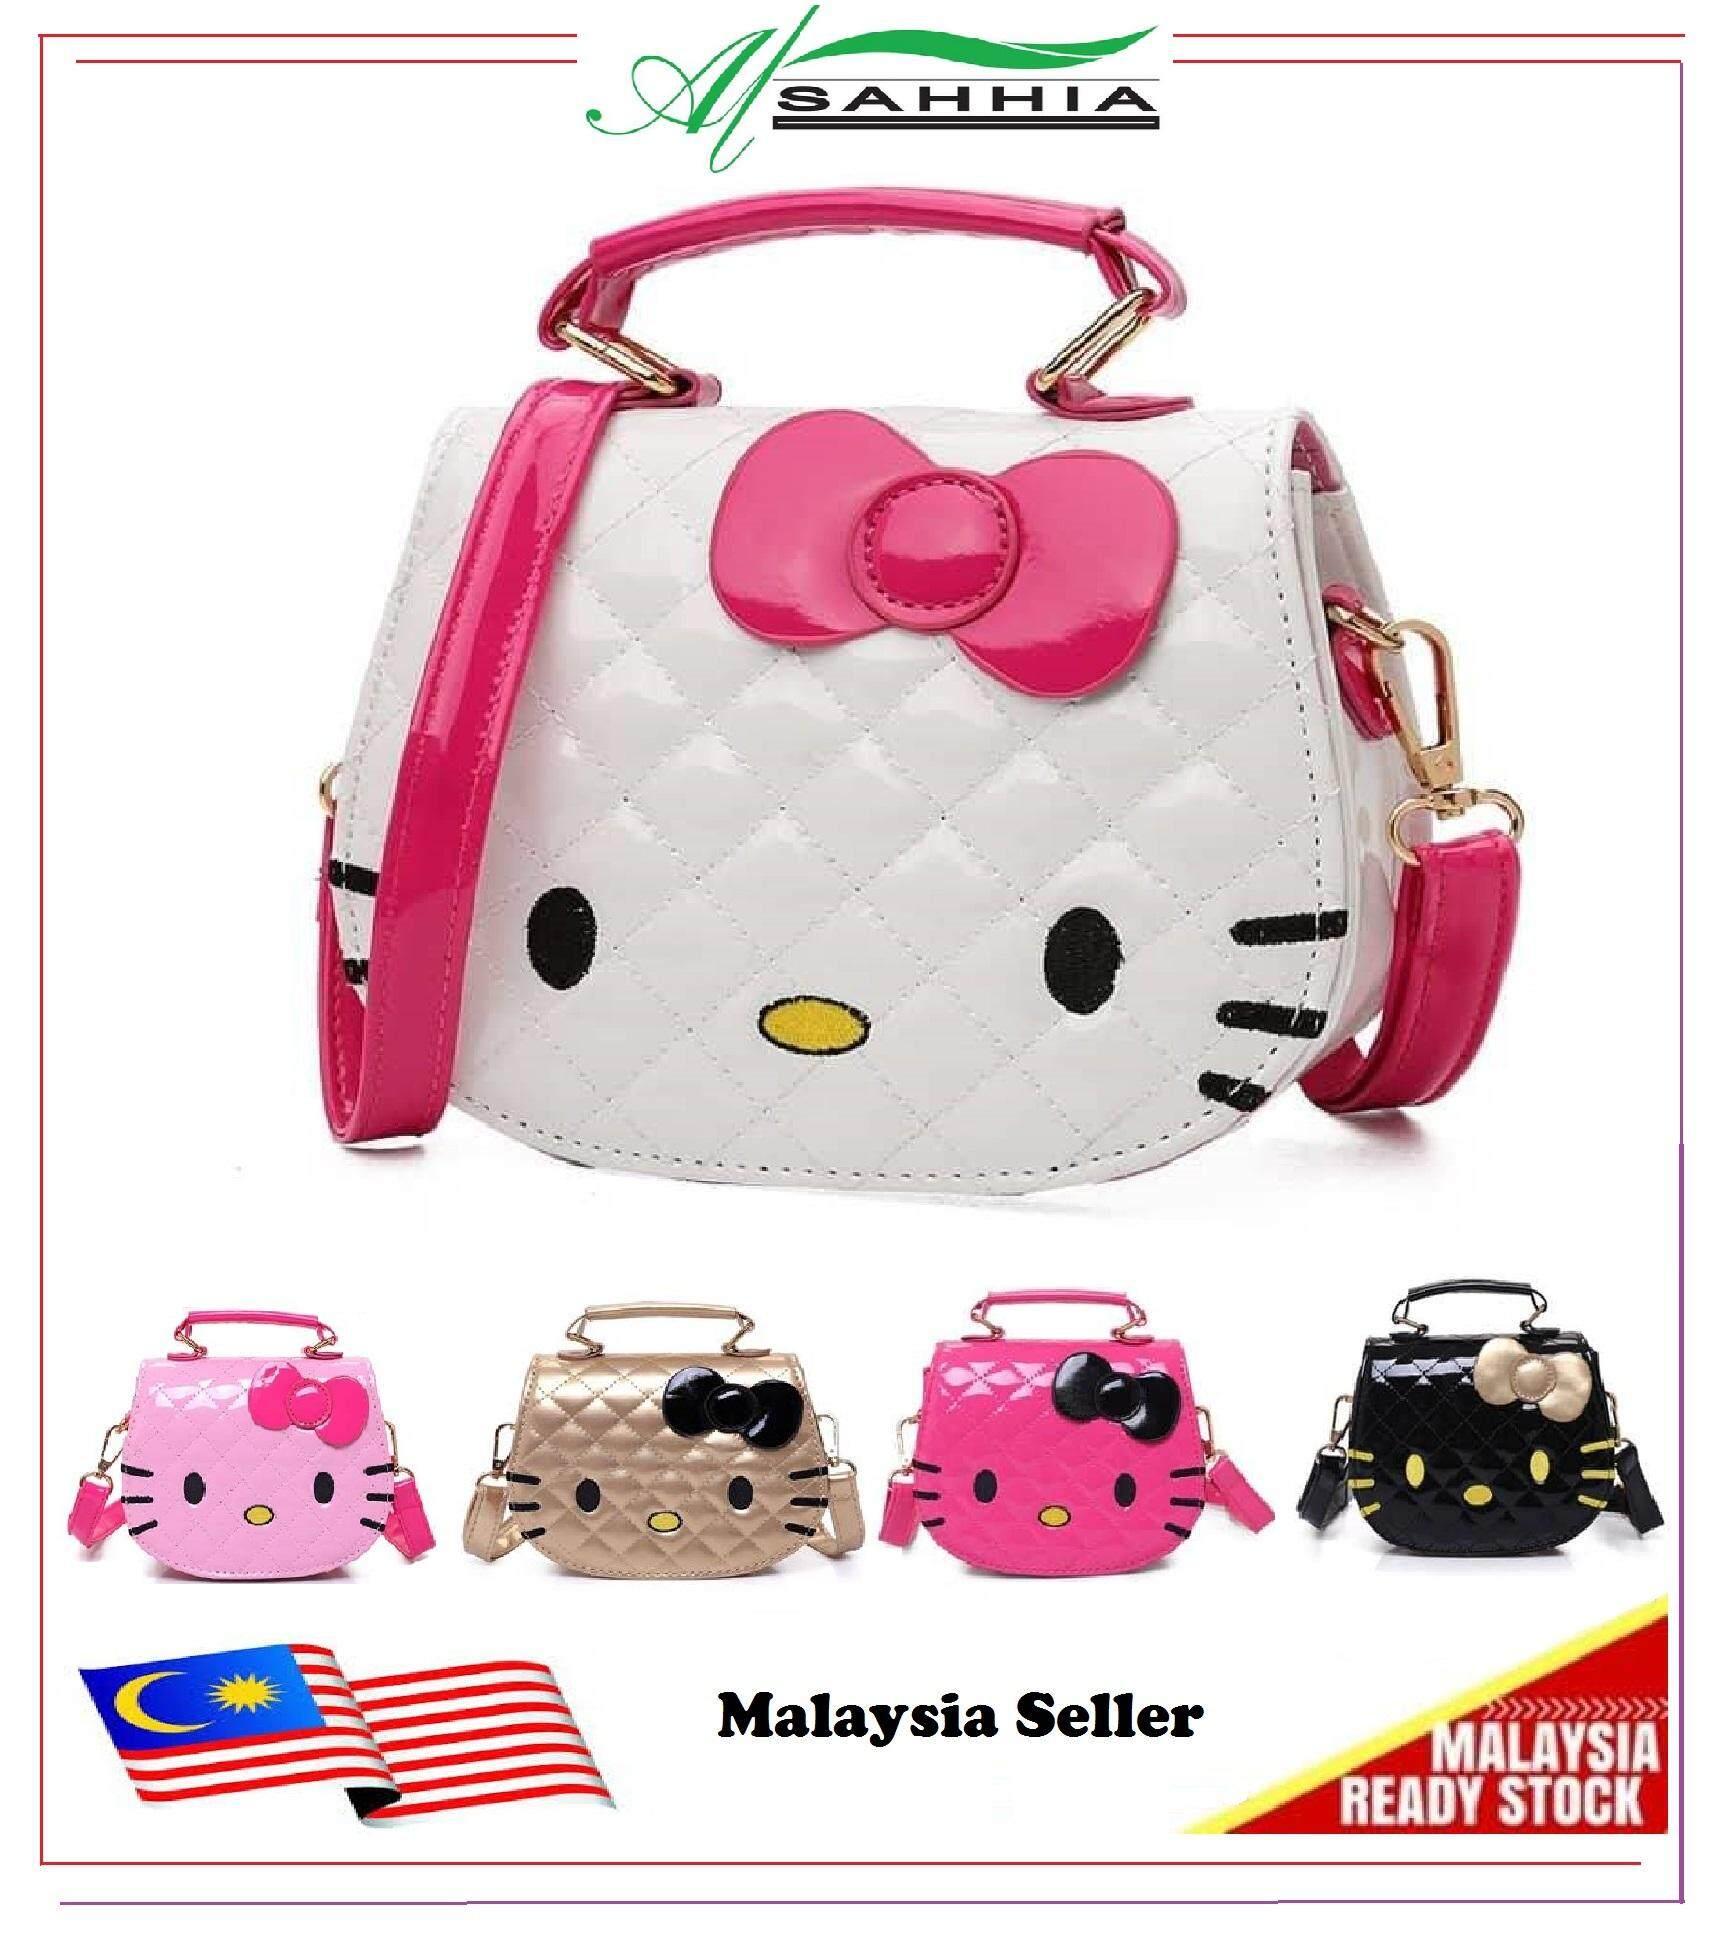 84a2e0e97462 3G3 Al Sahhia Ready Stock Kawaii Cute Pretty Bow Hello Kitty PU Handbag Kid  Girls Bag Sling Beg